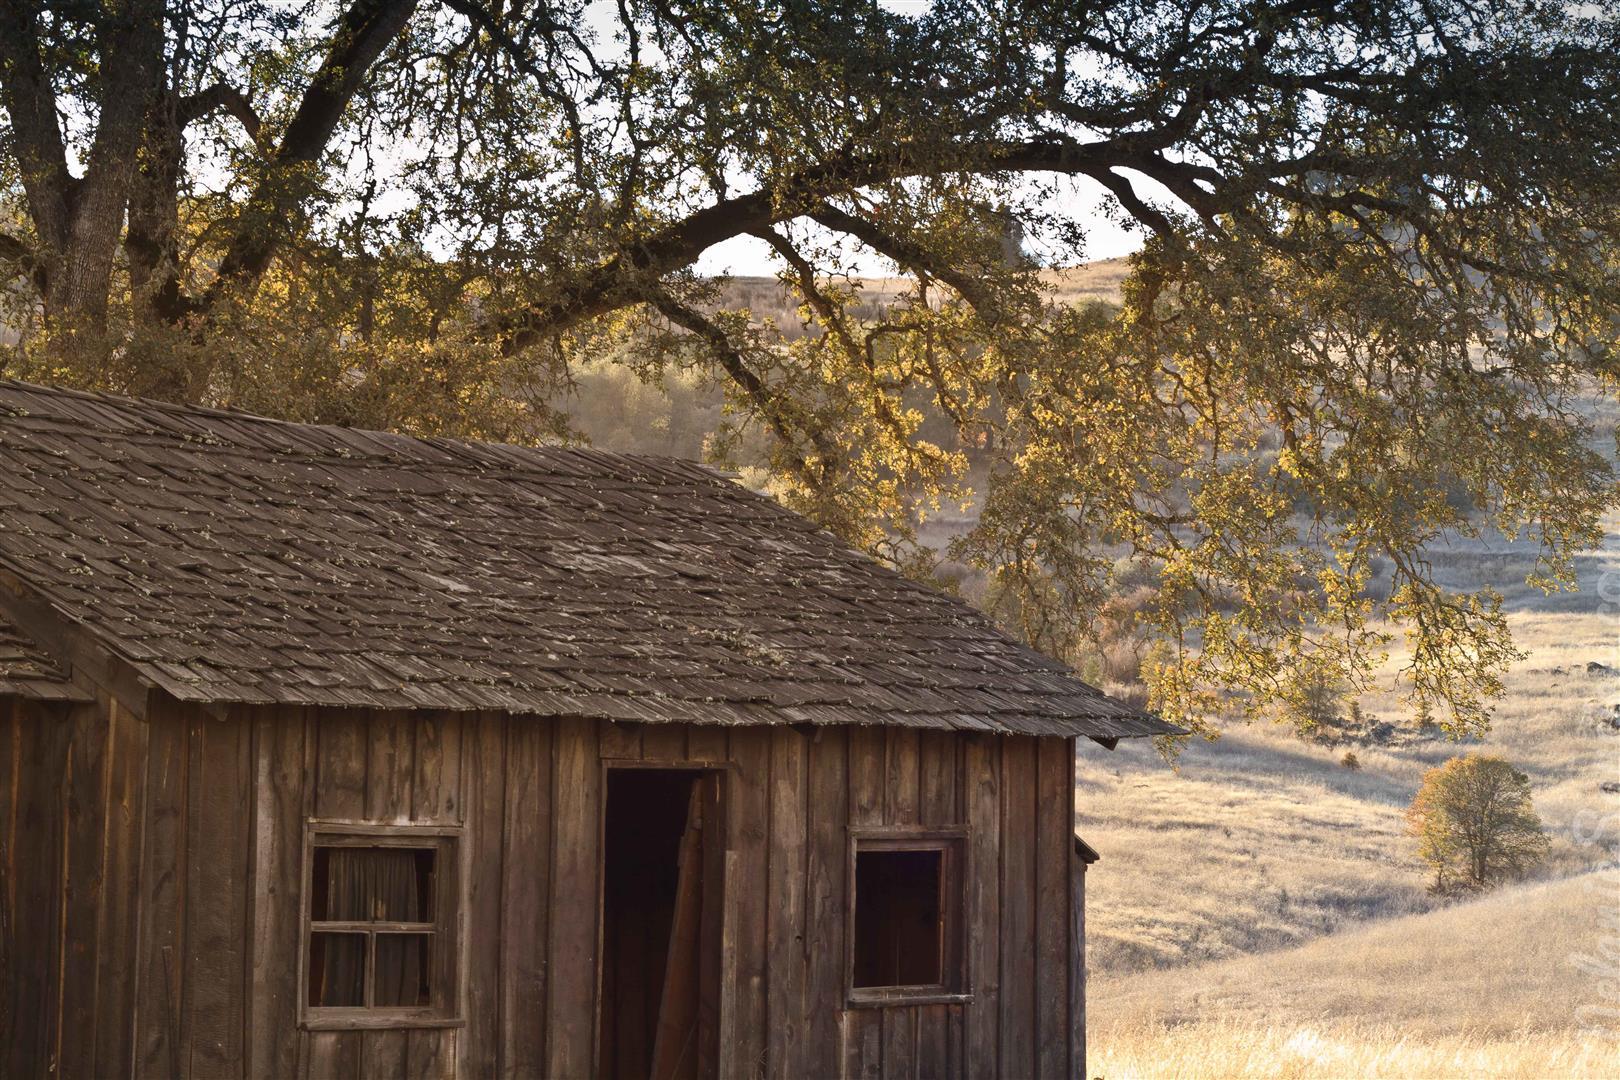 california cronan ranch (3)